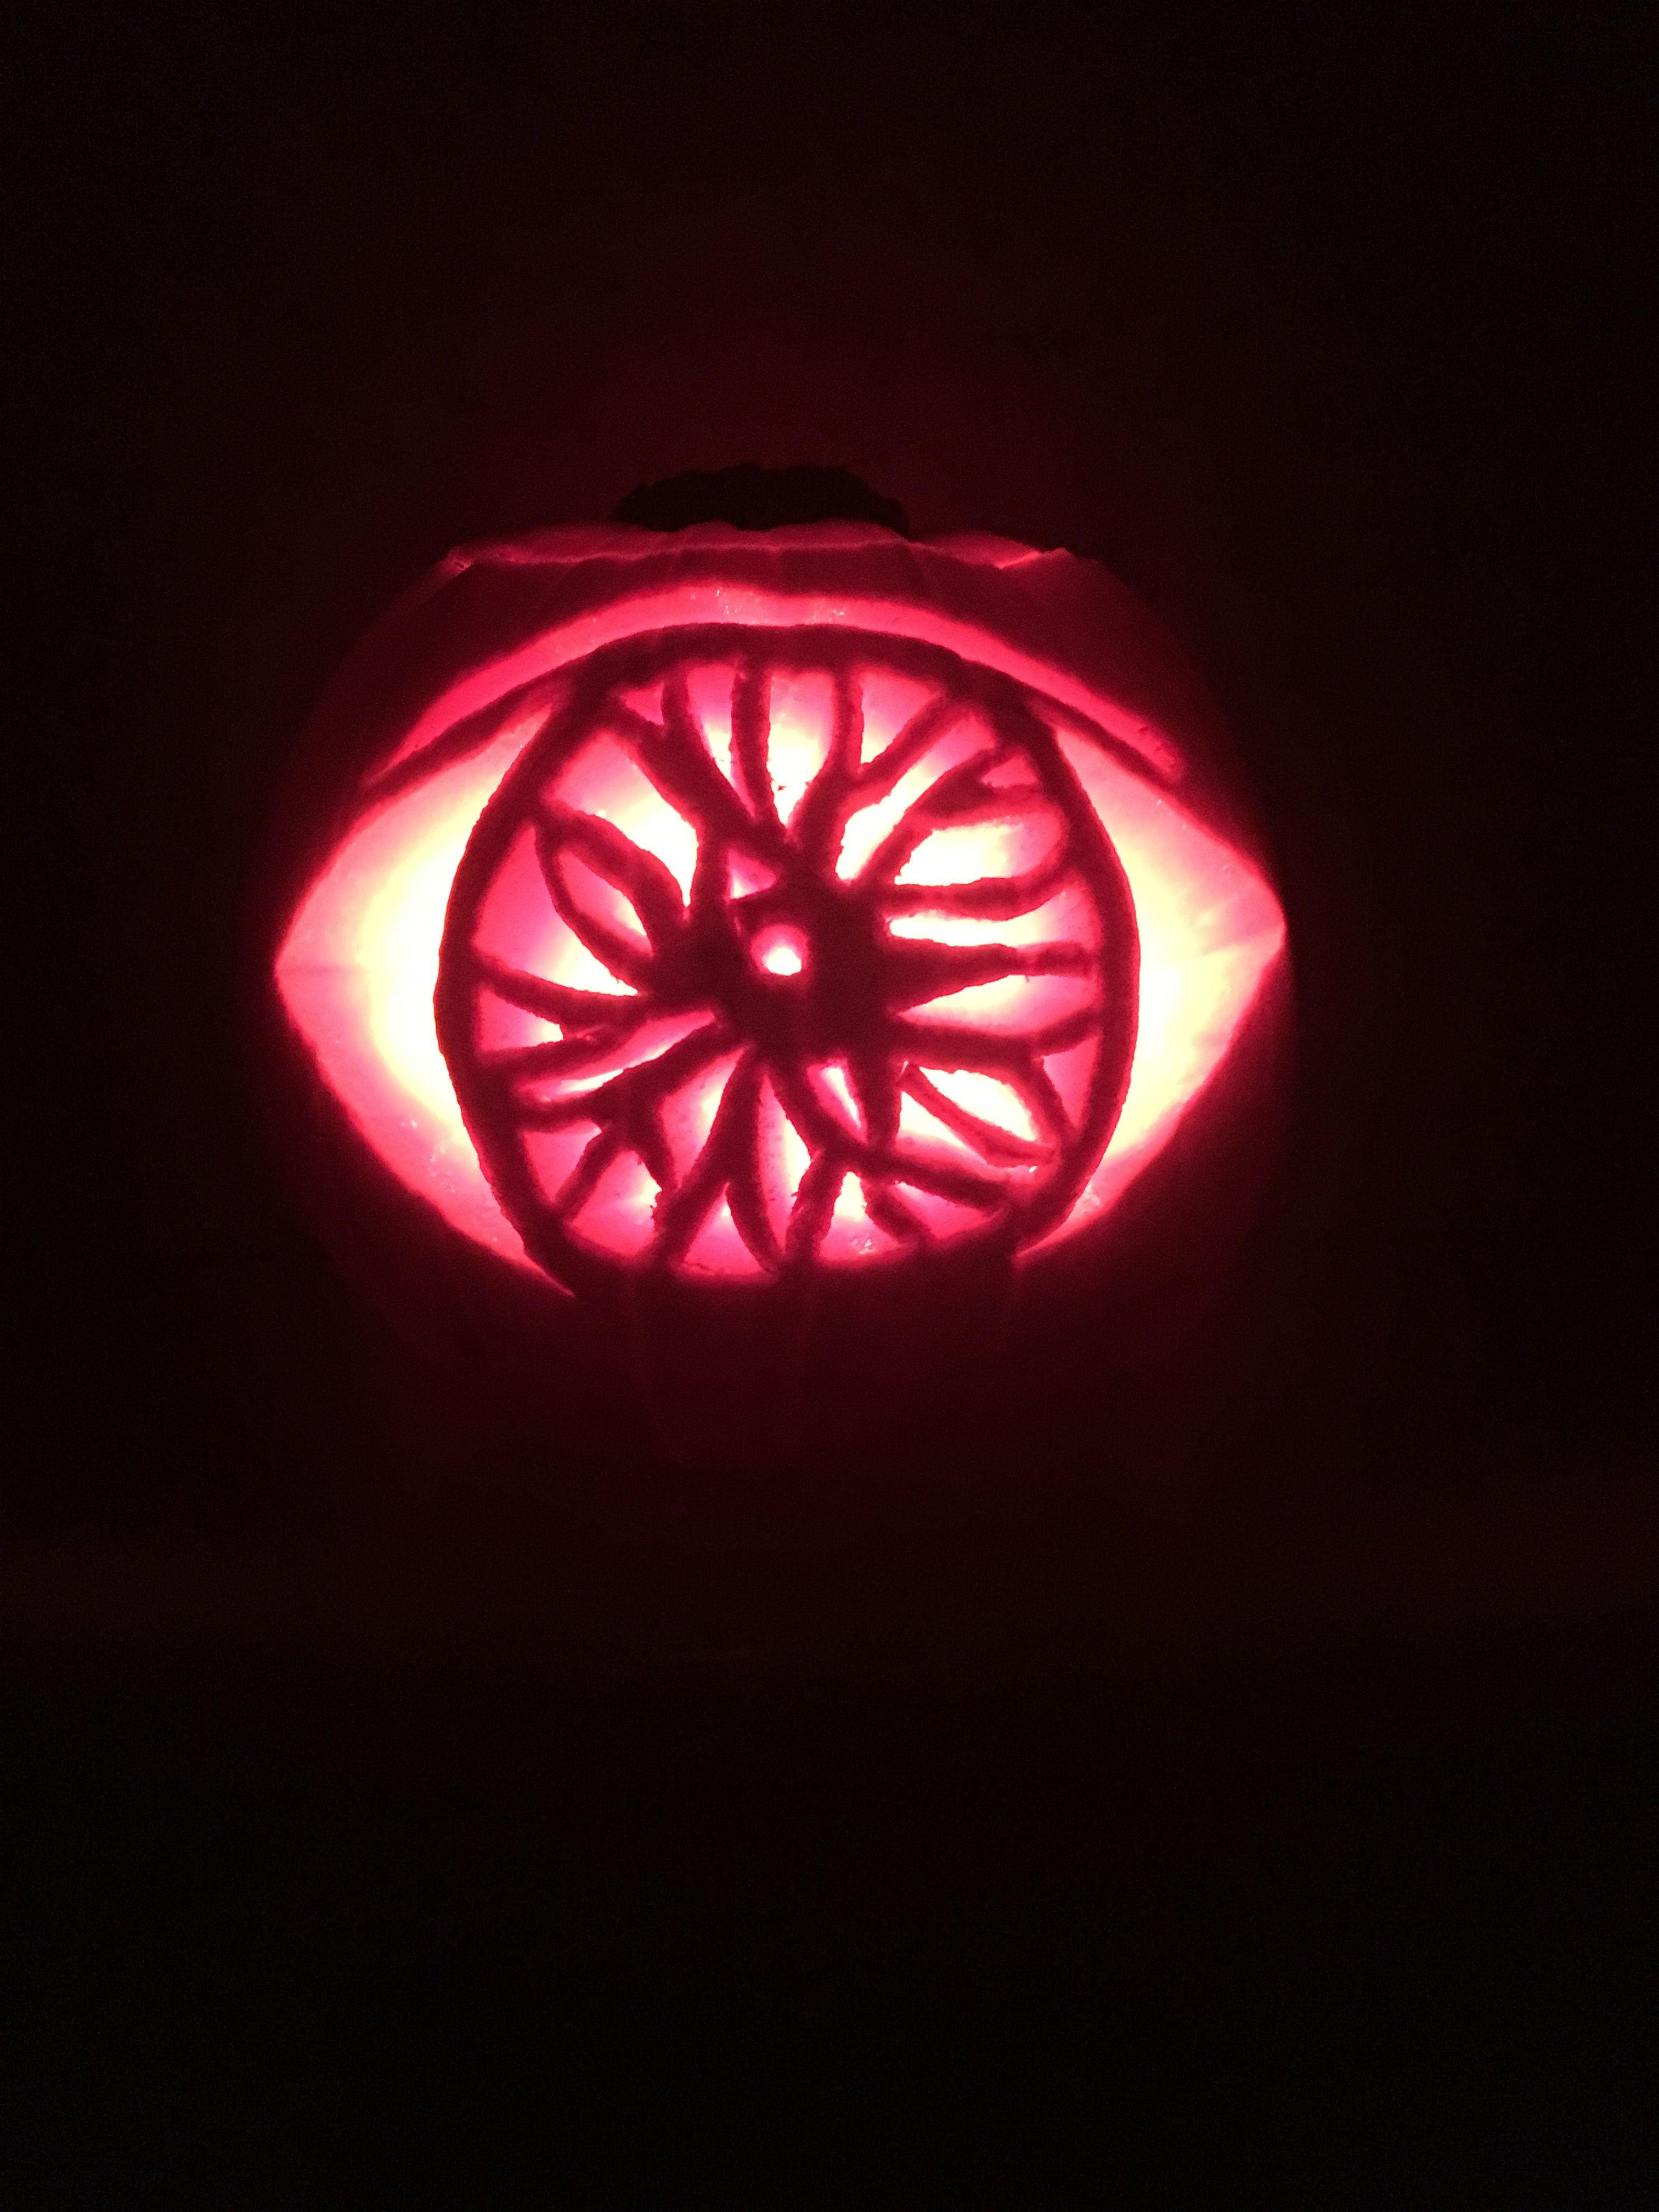 hallowe en pumpkin carving ideas evil eye jack o lantern